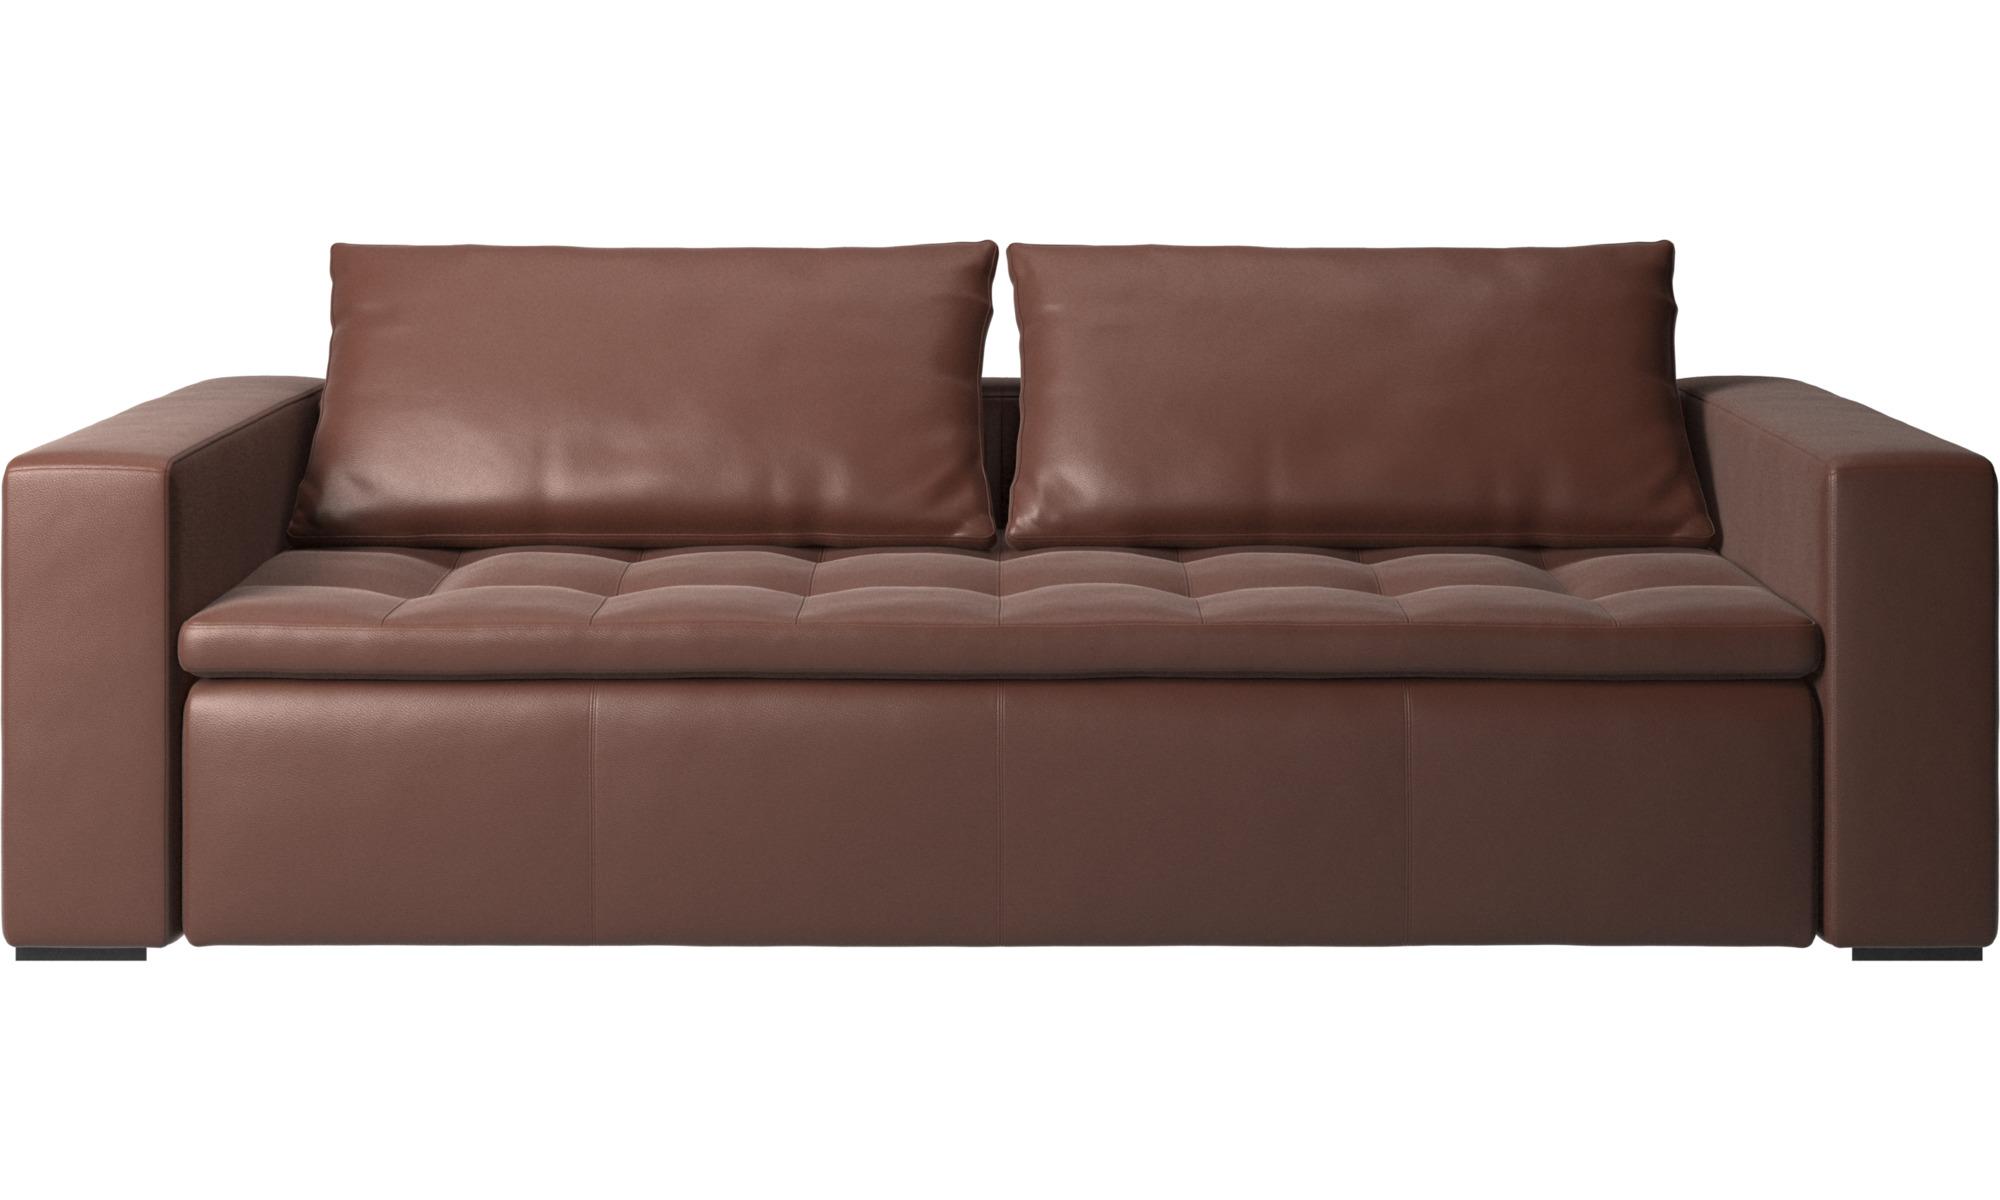 3 personers sofaer mezzo sofa boconcept. Black Bedroom Furniture Sets. Home Design Ideas